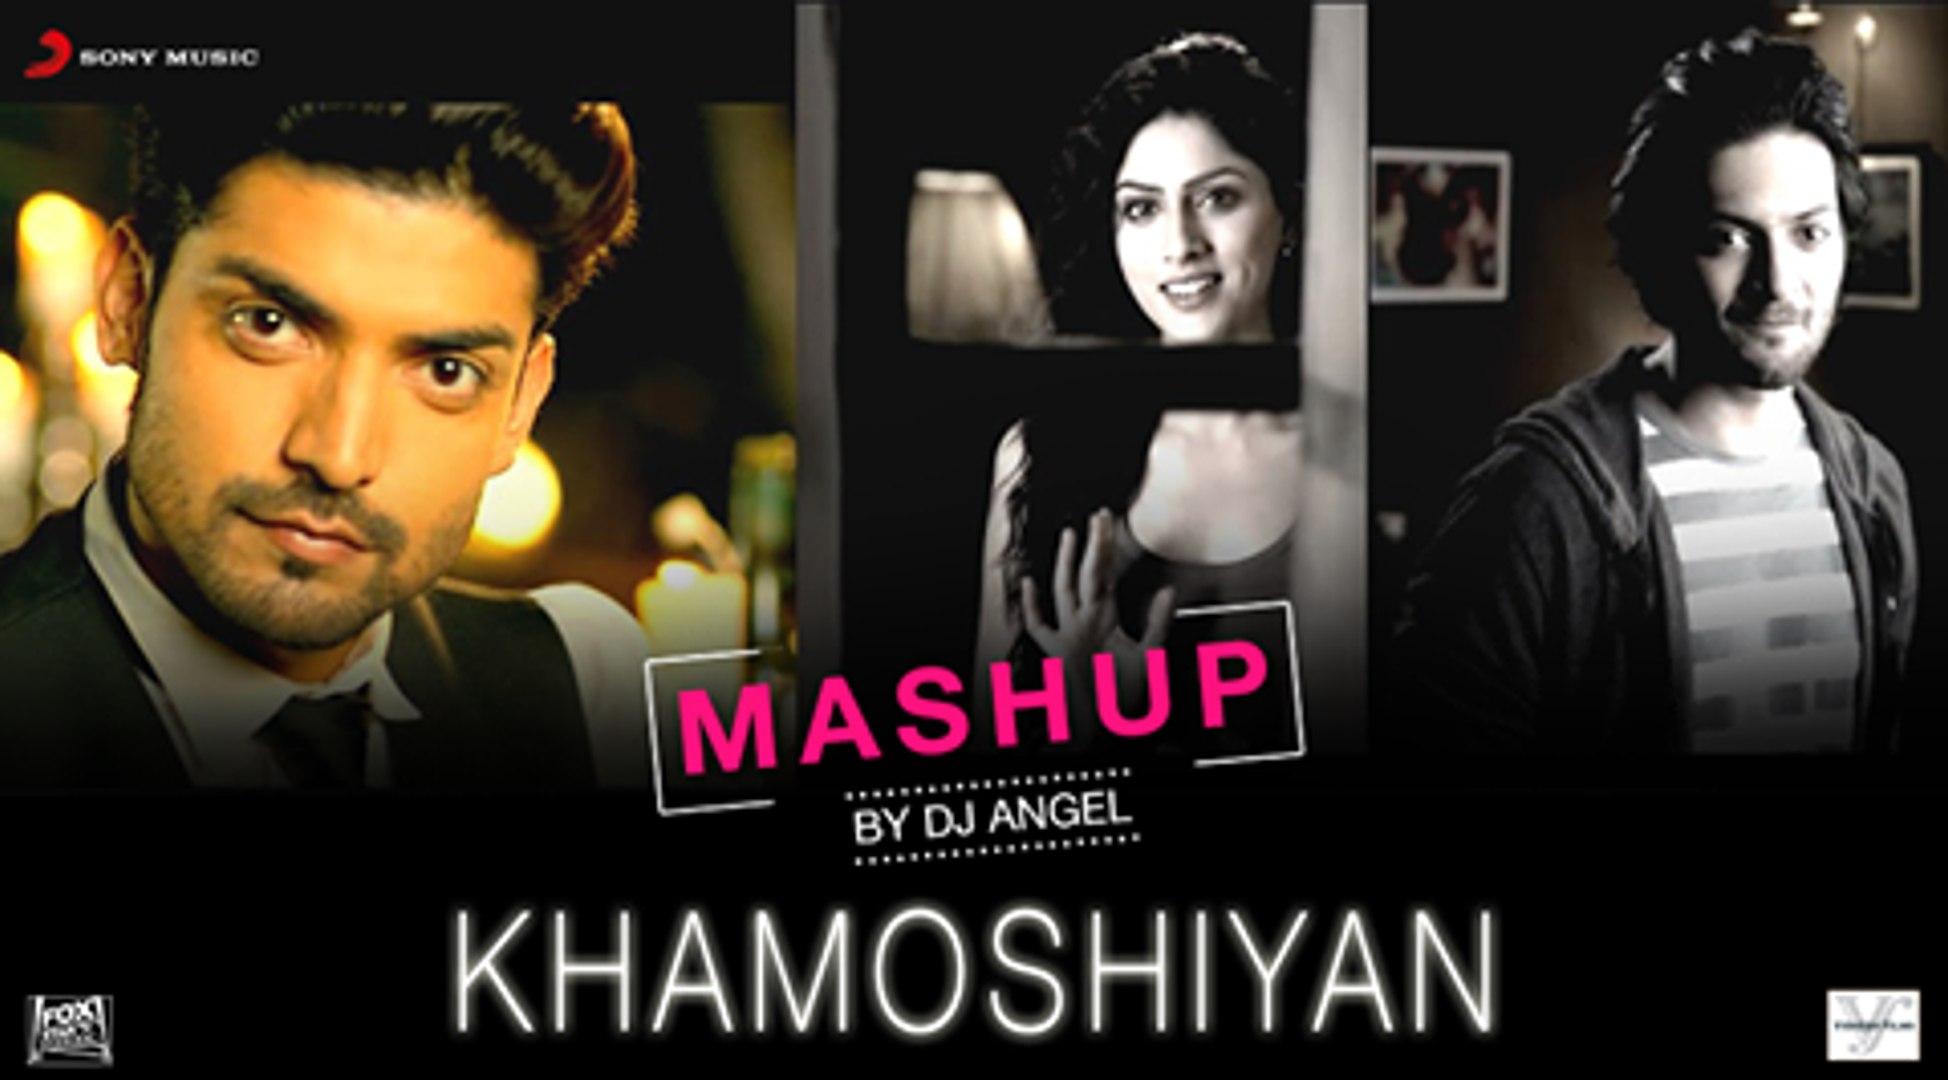 Khamoshiyan Mashup - DJ Angel | Arijit Singh | Jeet Gannguli | Ankit Tiwari | Bobby (BollywoodMashup